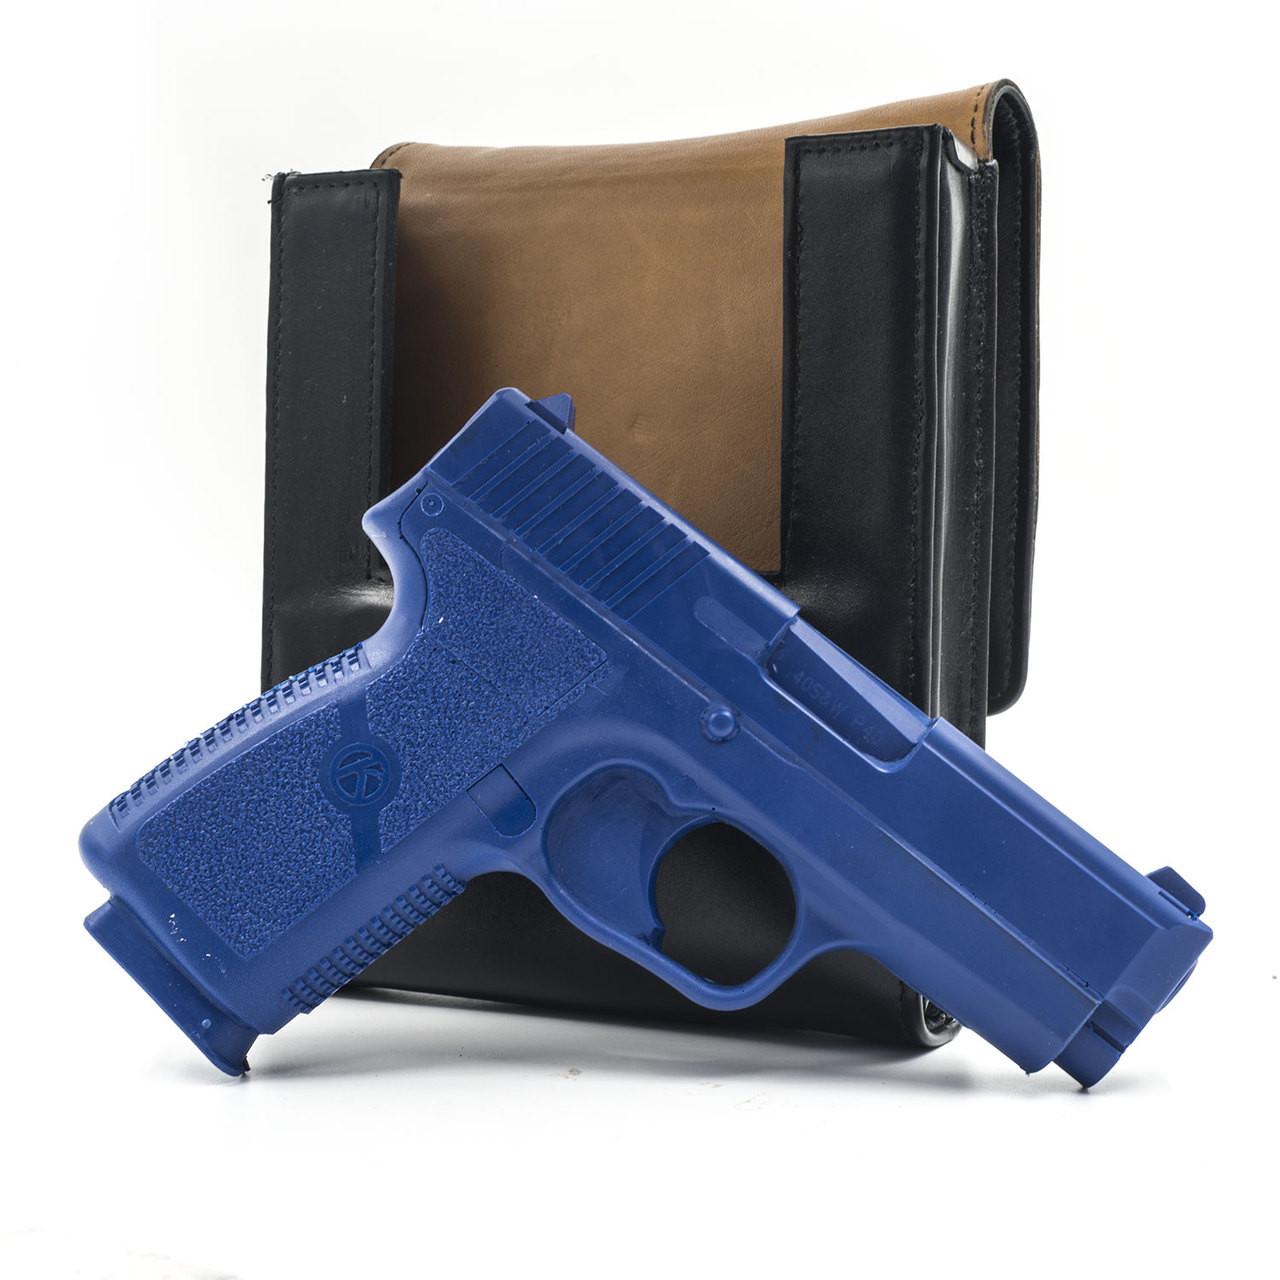 Kahr P9 Concealed Carry Holster (Belt Loop)